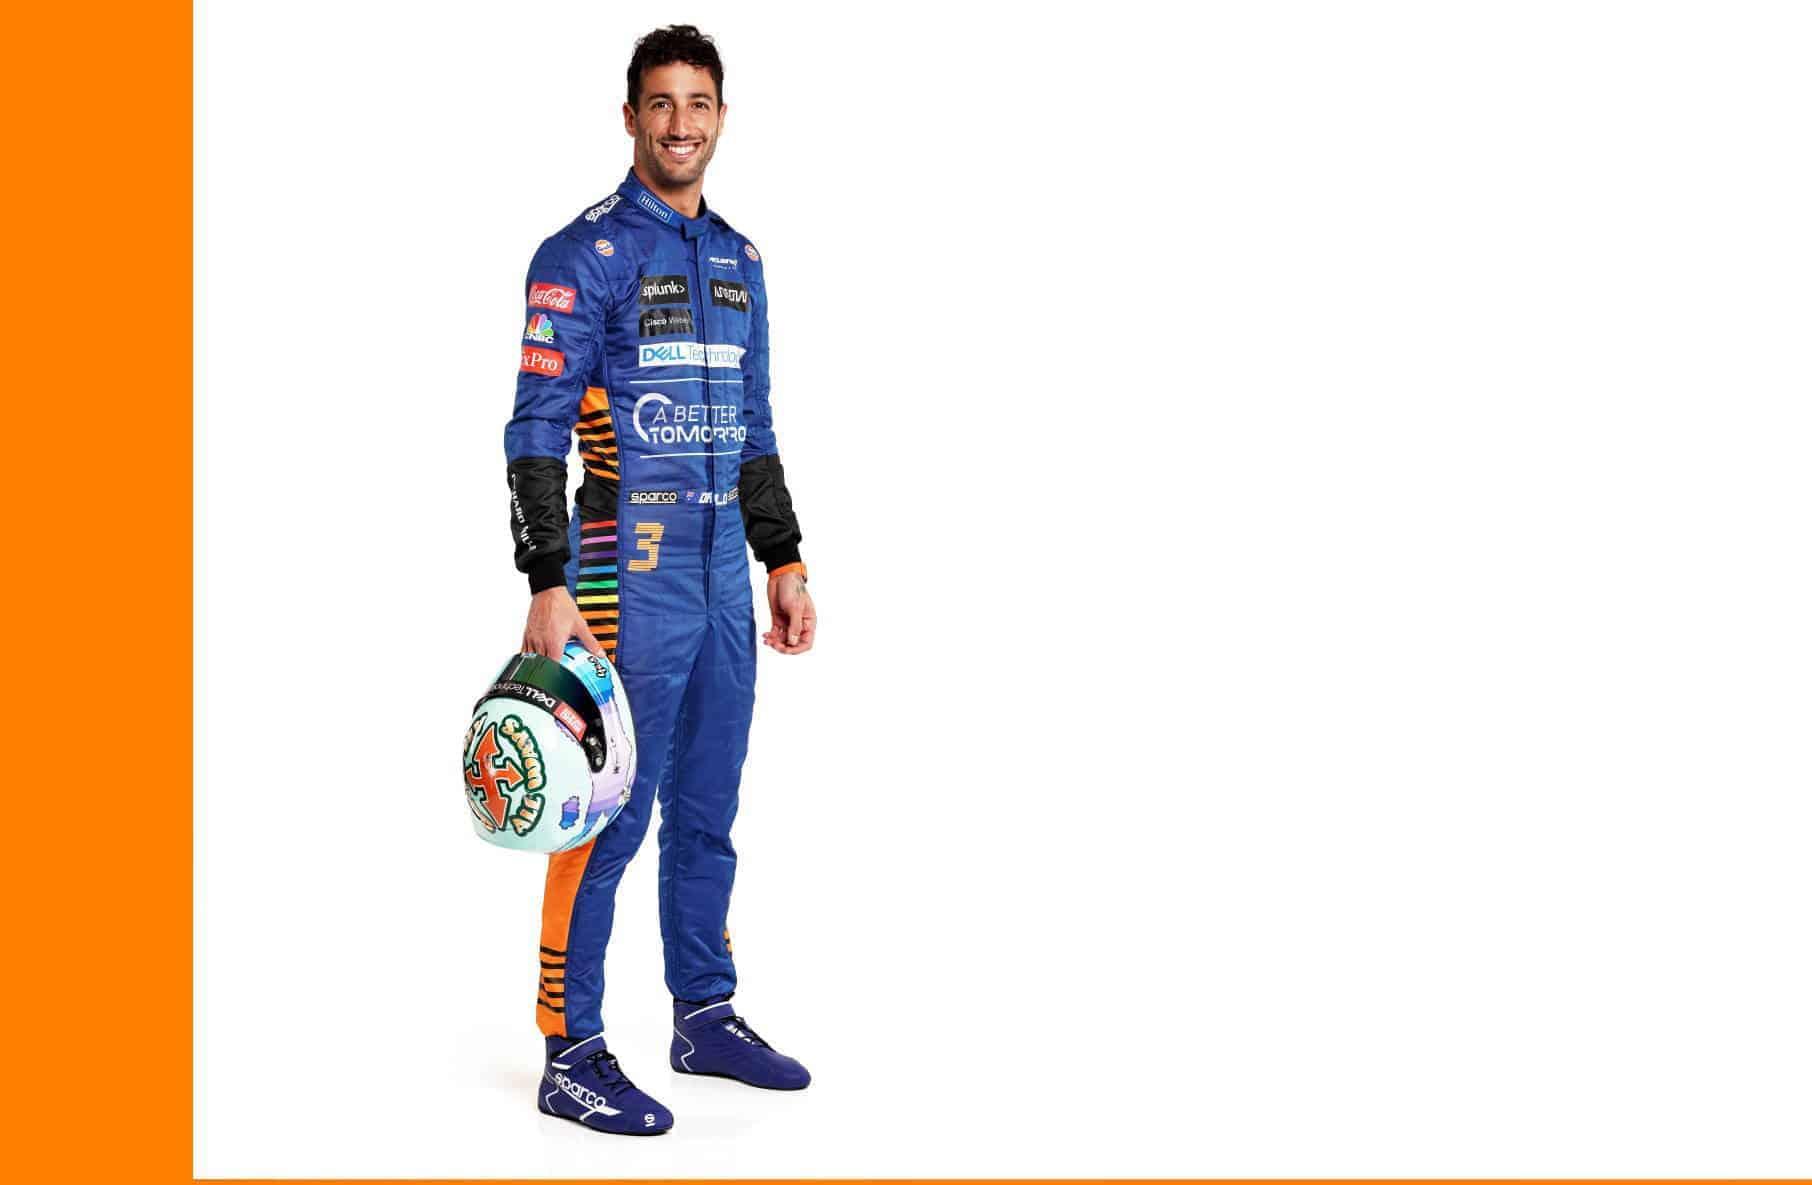 Daniel-Ricciardo-F1-2021-Launch-Studio-Photo-McLaren-Edited-by-MAXF1net